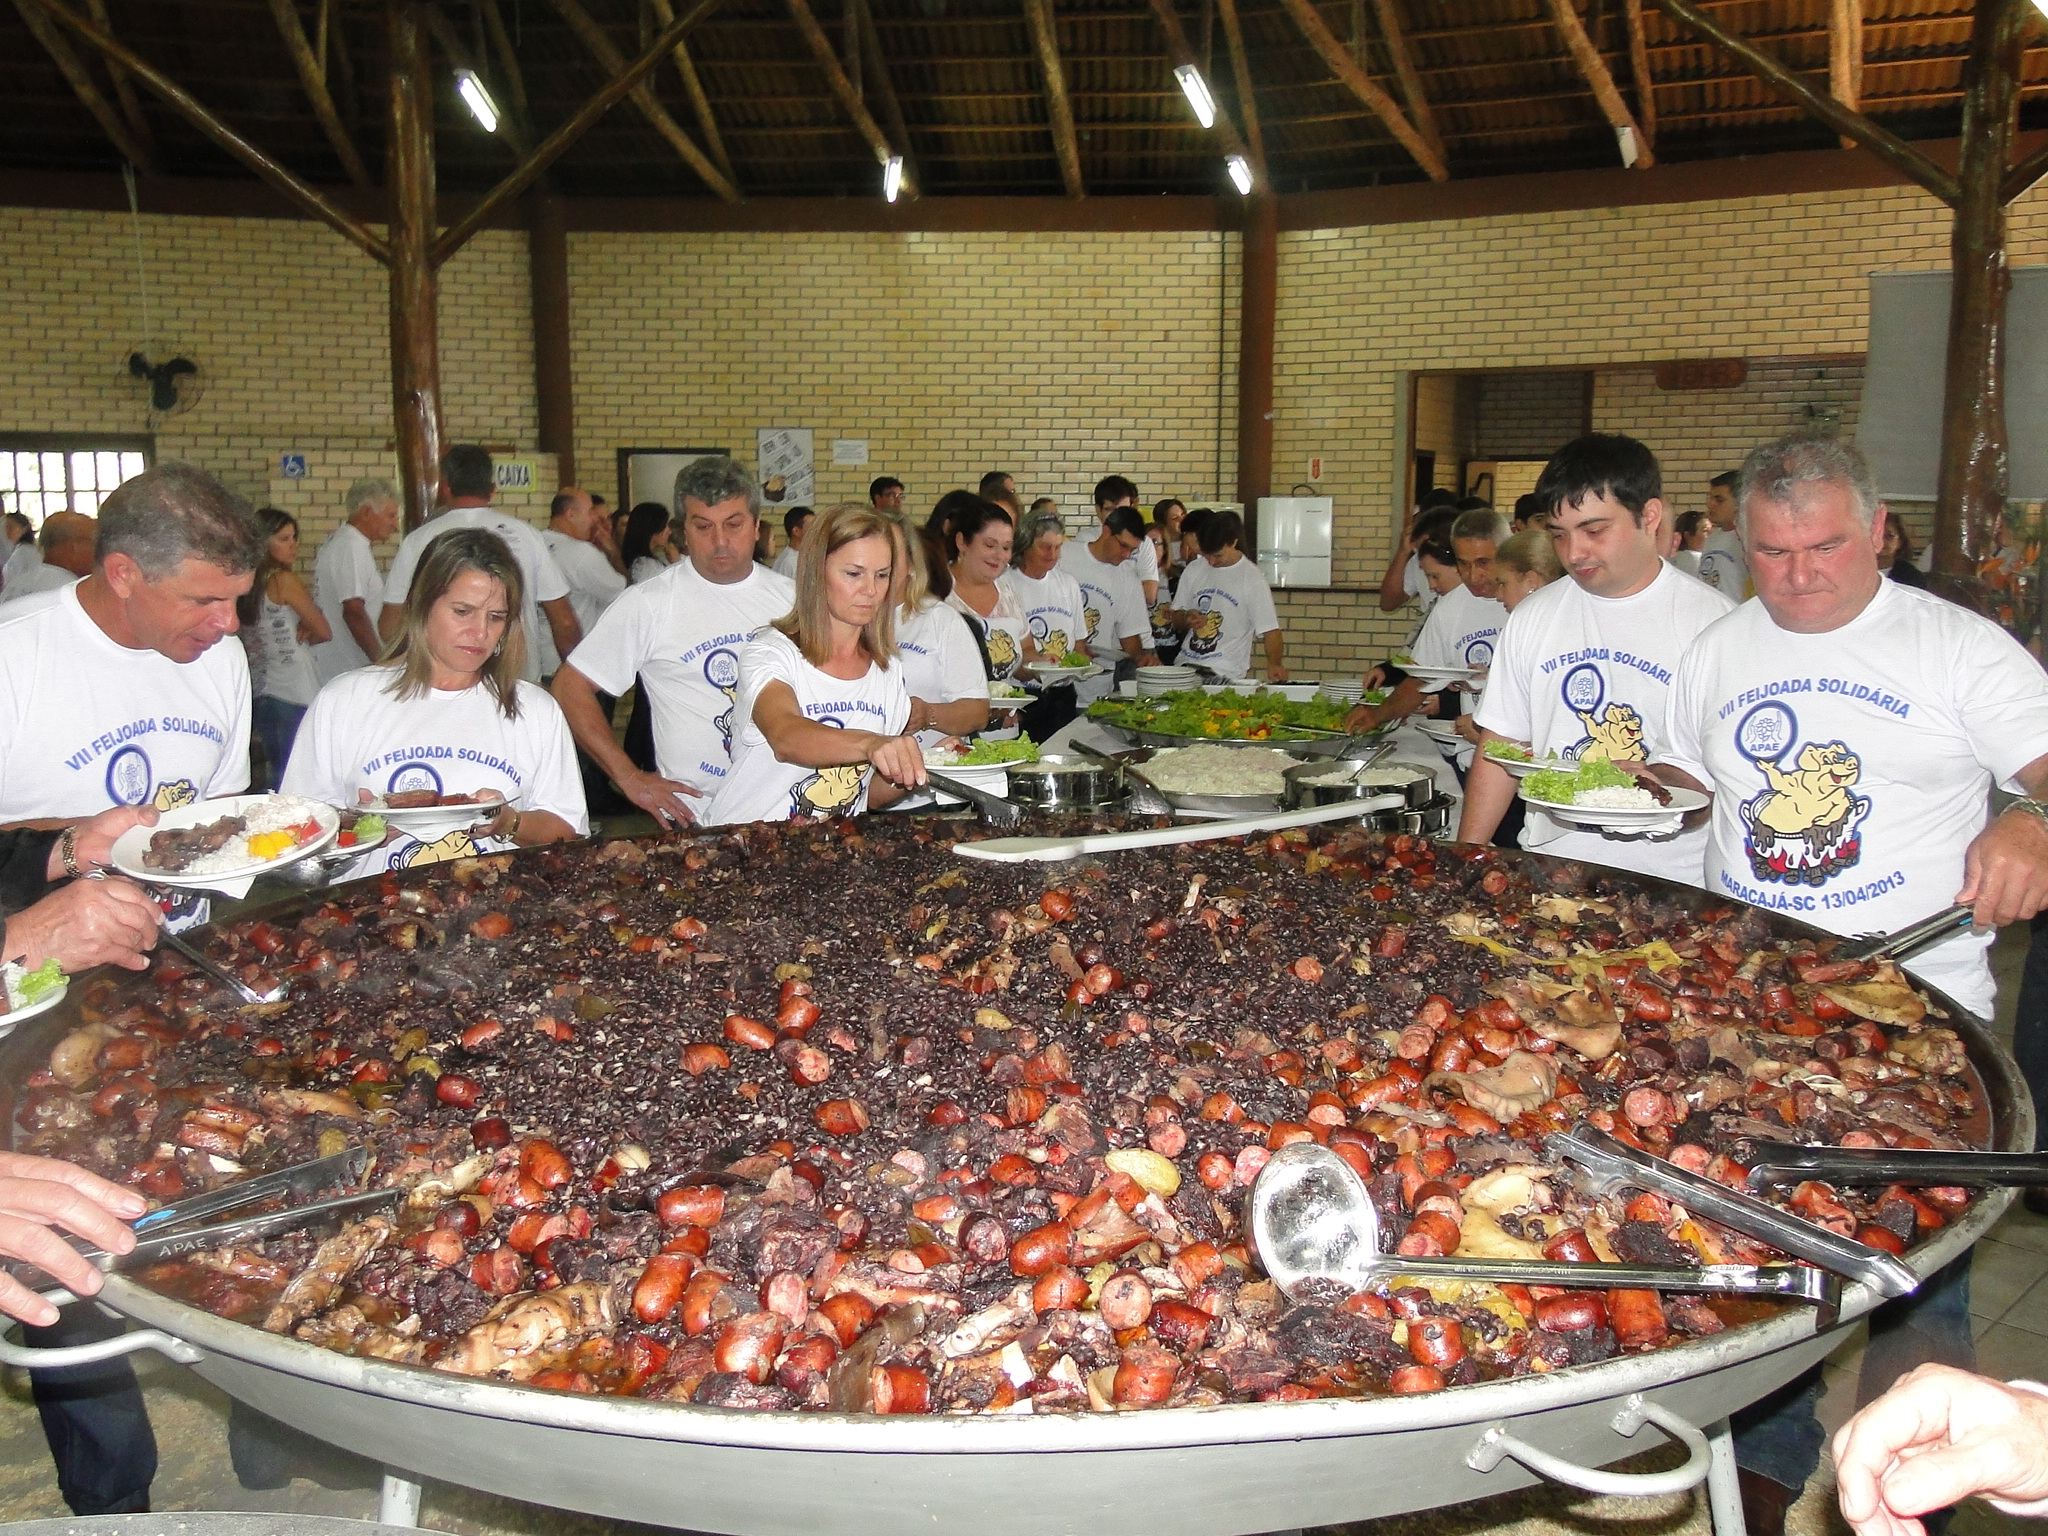 Feijoada da APAE de Joinville 50 Anos será neste sábado (11/7), participe!